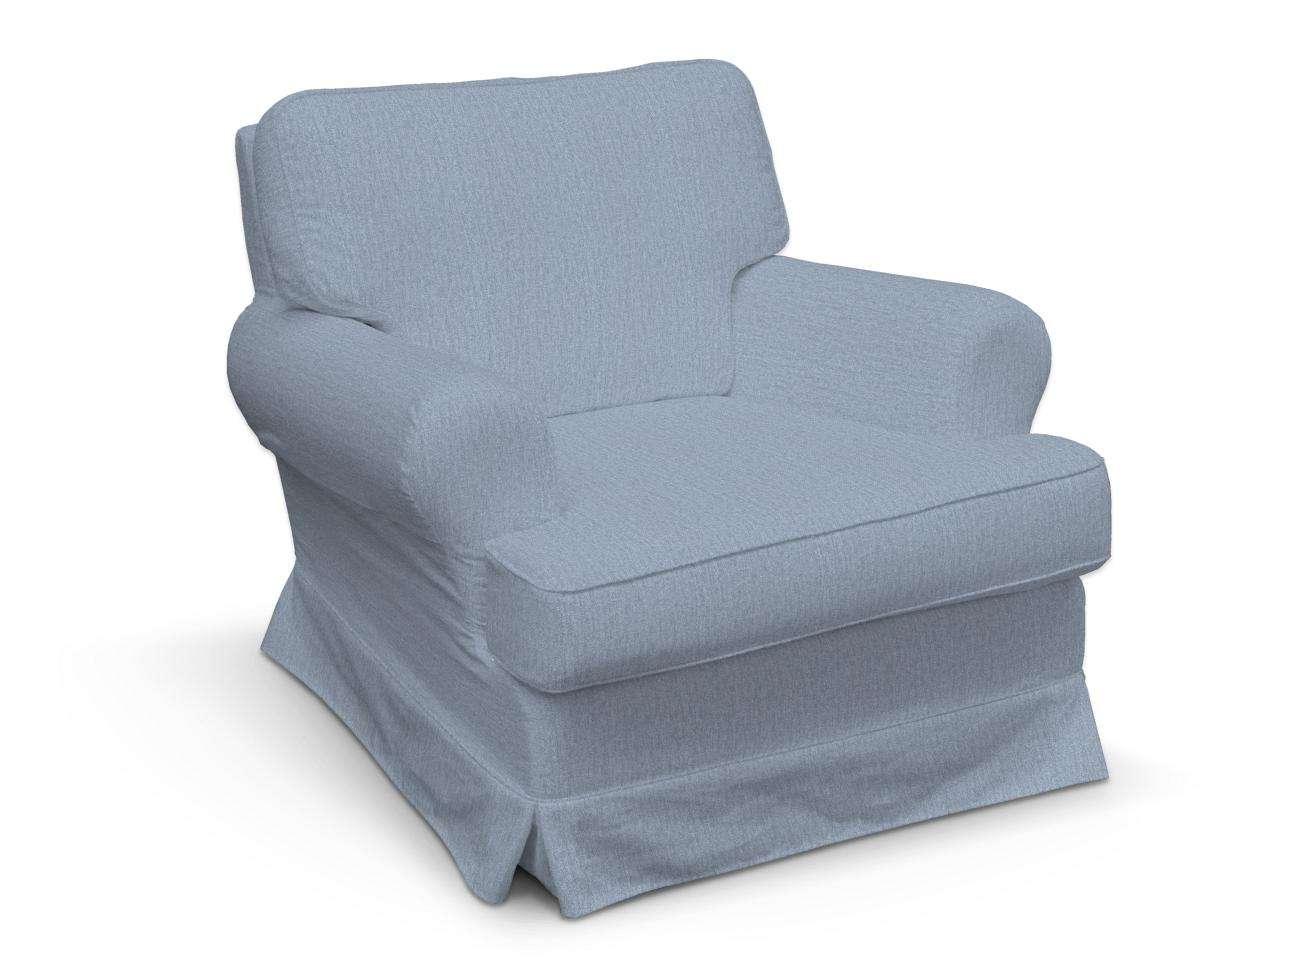 Pokrowiec na fotel Barkaby fotel Barkaby w kolekcji Chenille, tkanina: 702-13